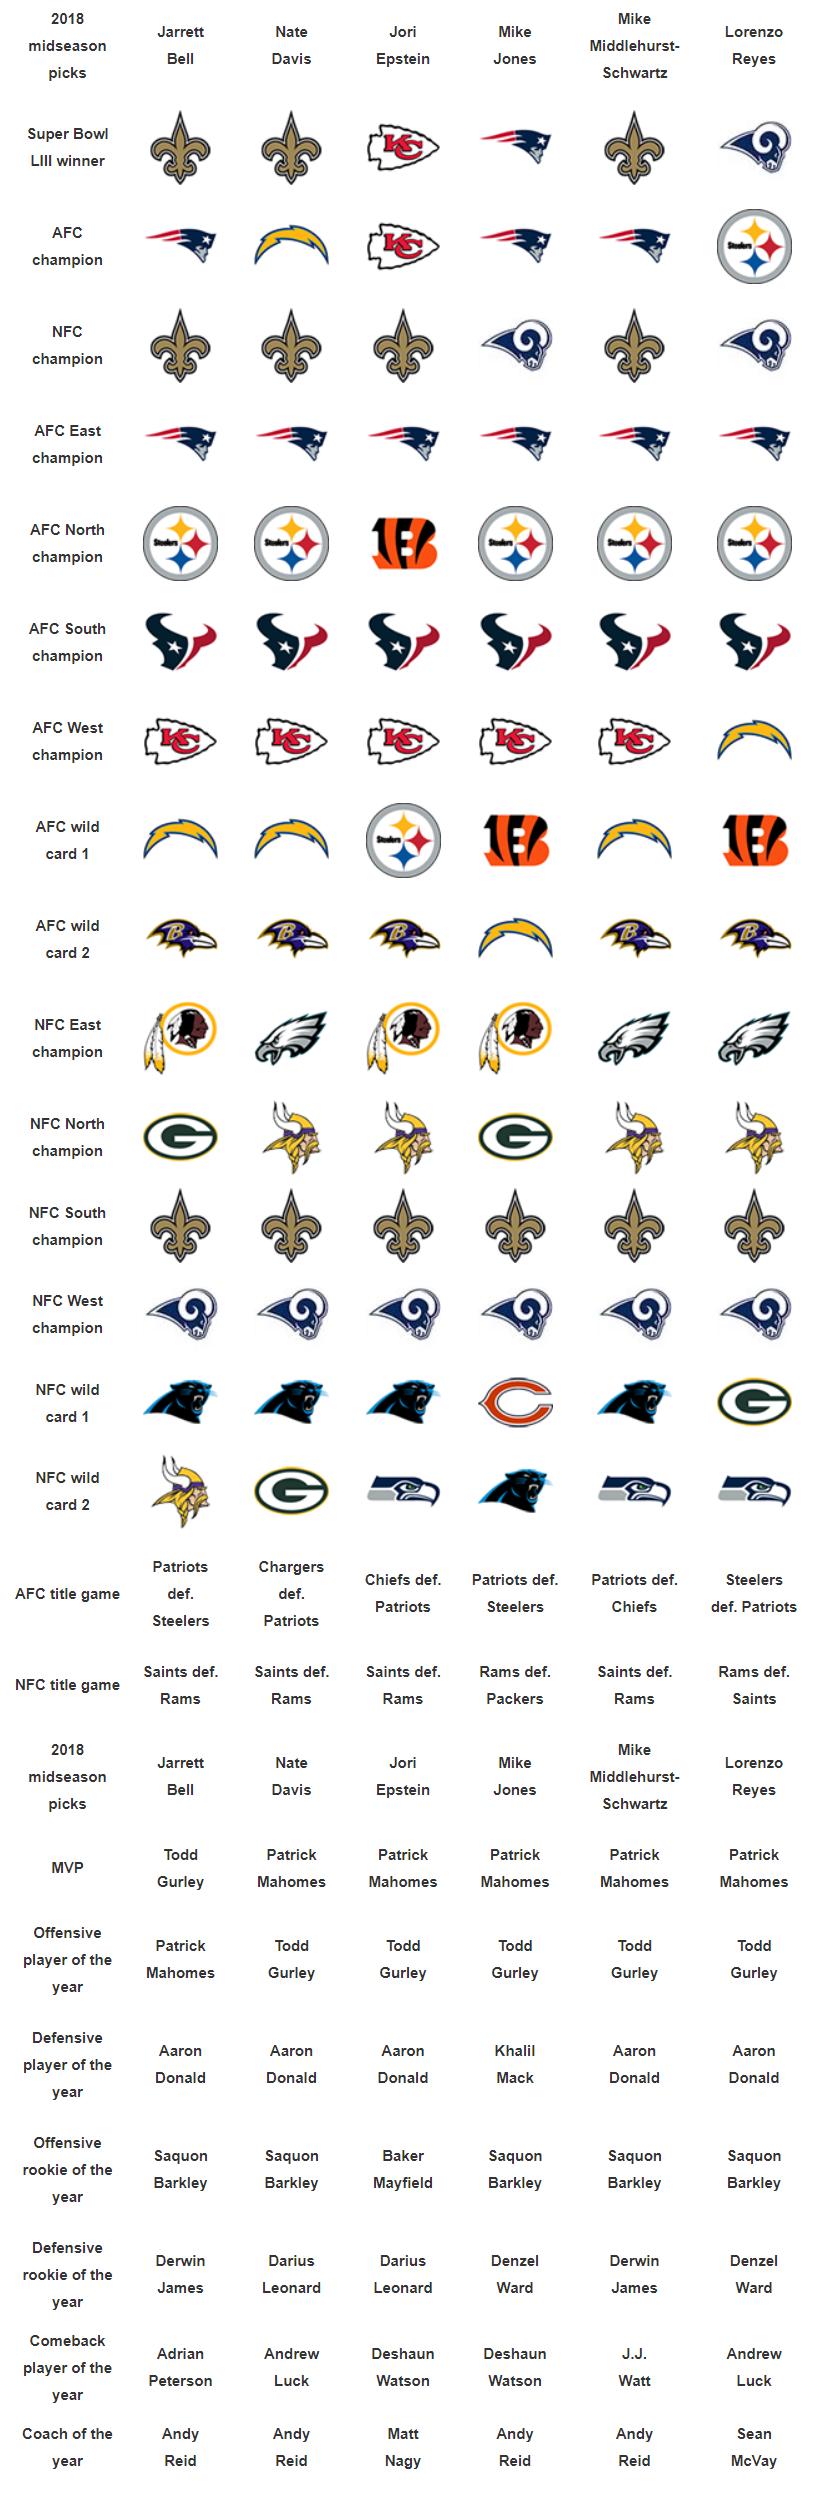 2018 NFL midseason predictions: Super Bowl, MVP, rookie of year, more